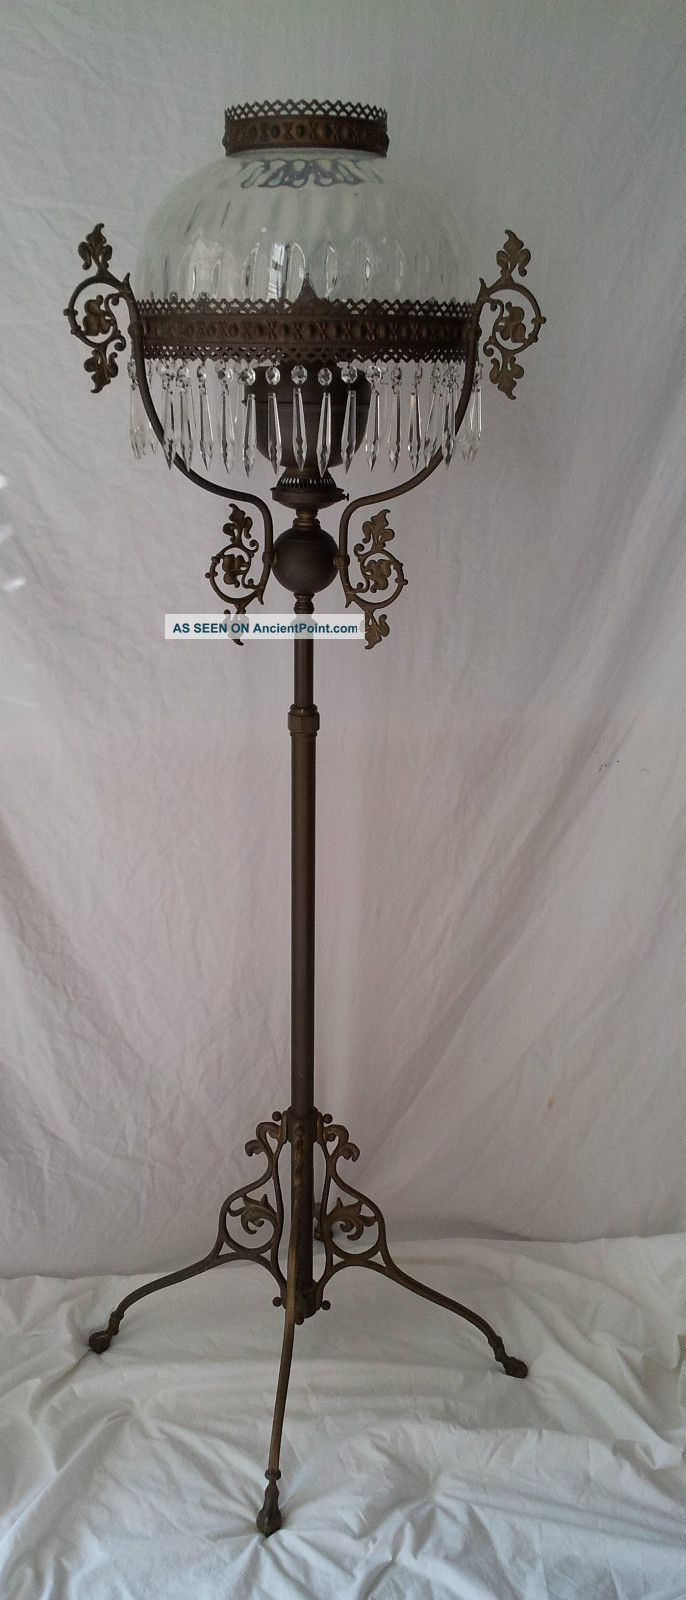 Vintage floor lamps - Antique Victorian Style Kerosene Oil Floor Lamp Brass John Scott